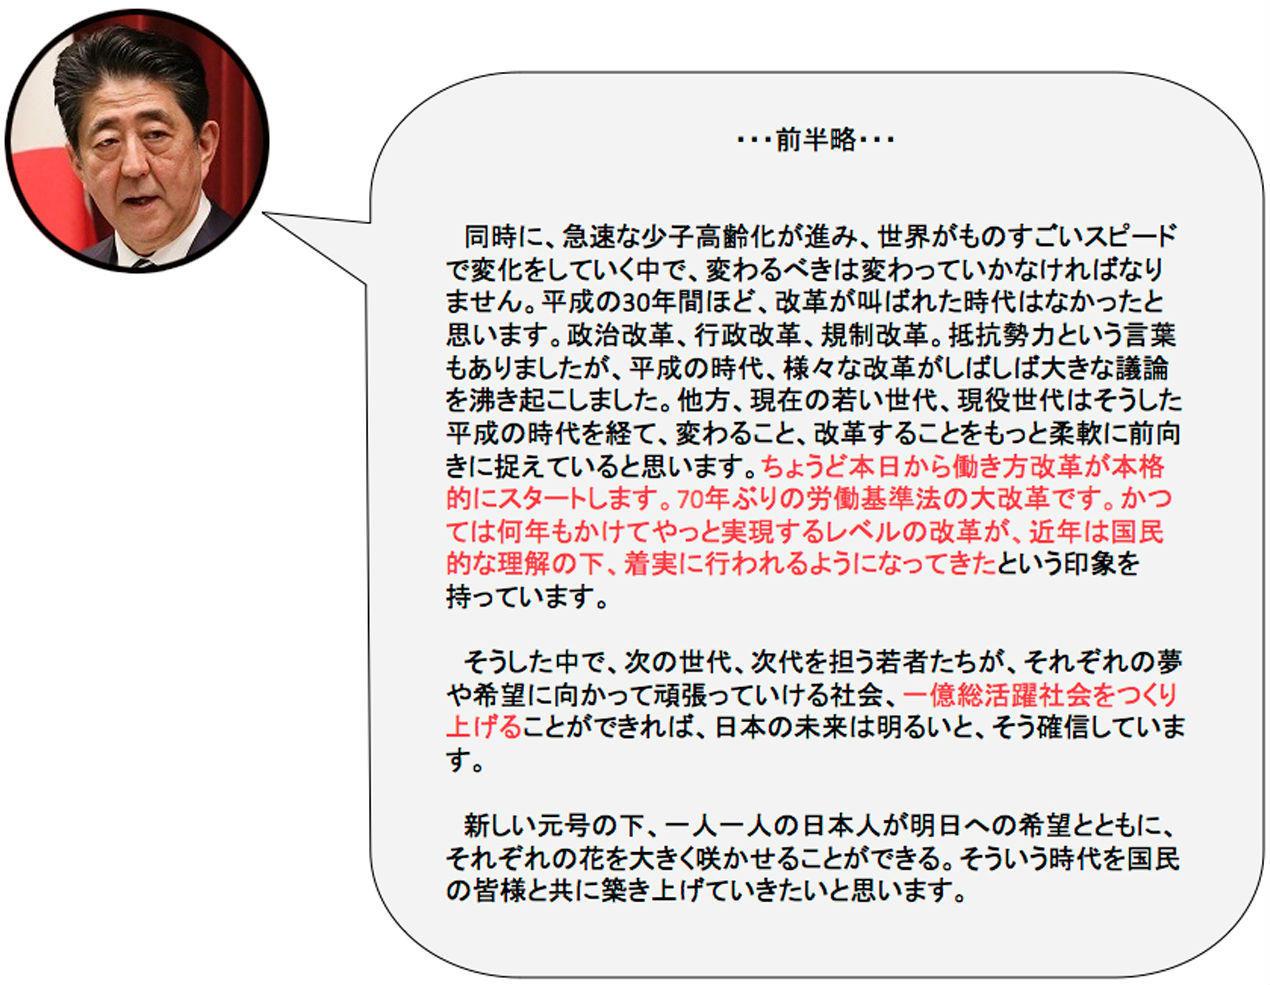 http://hunter-investigate.jp/news/ffd4762b2ddd091c5708d48b673c943da8b990a7.jpg